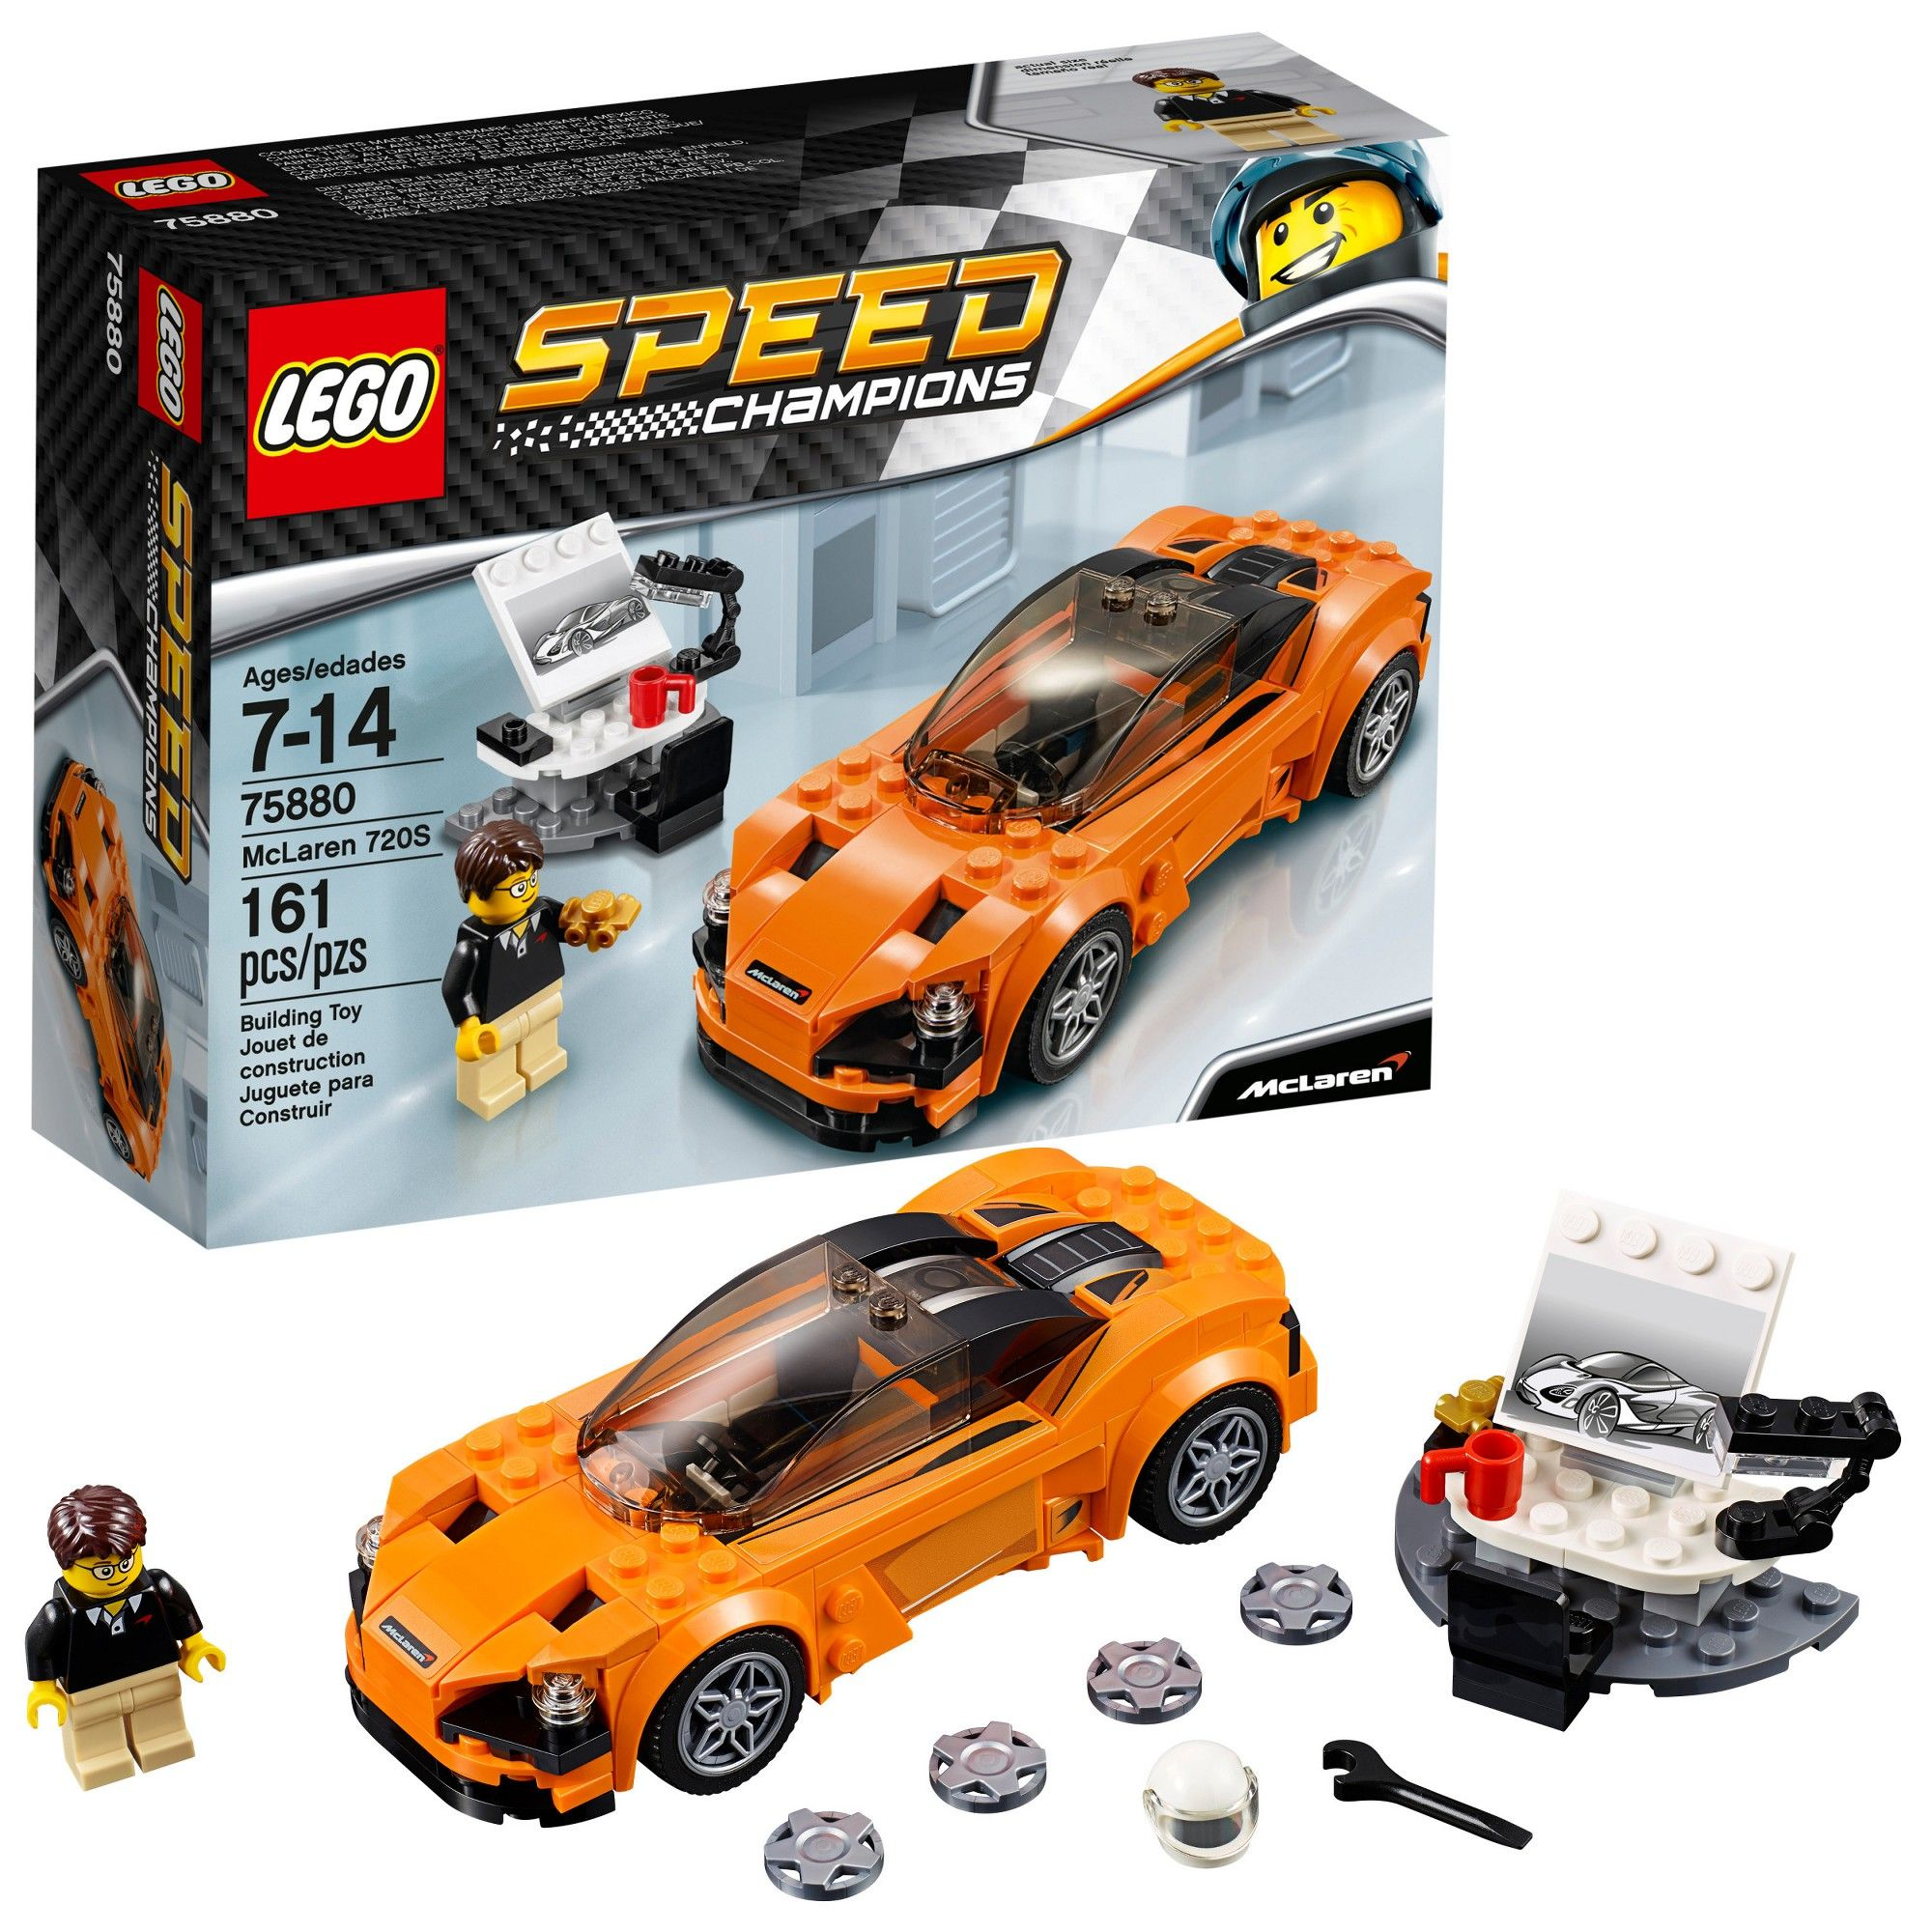 75880 McLaren 720S LEGO Speed Champions Set New Sealed